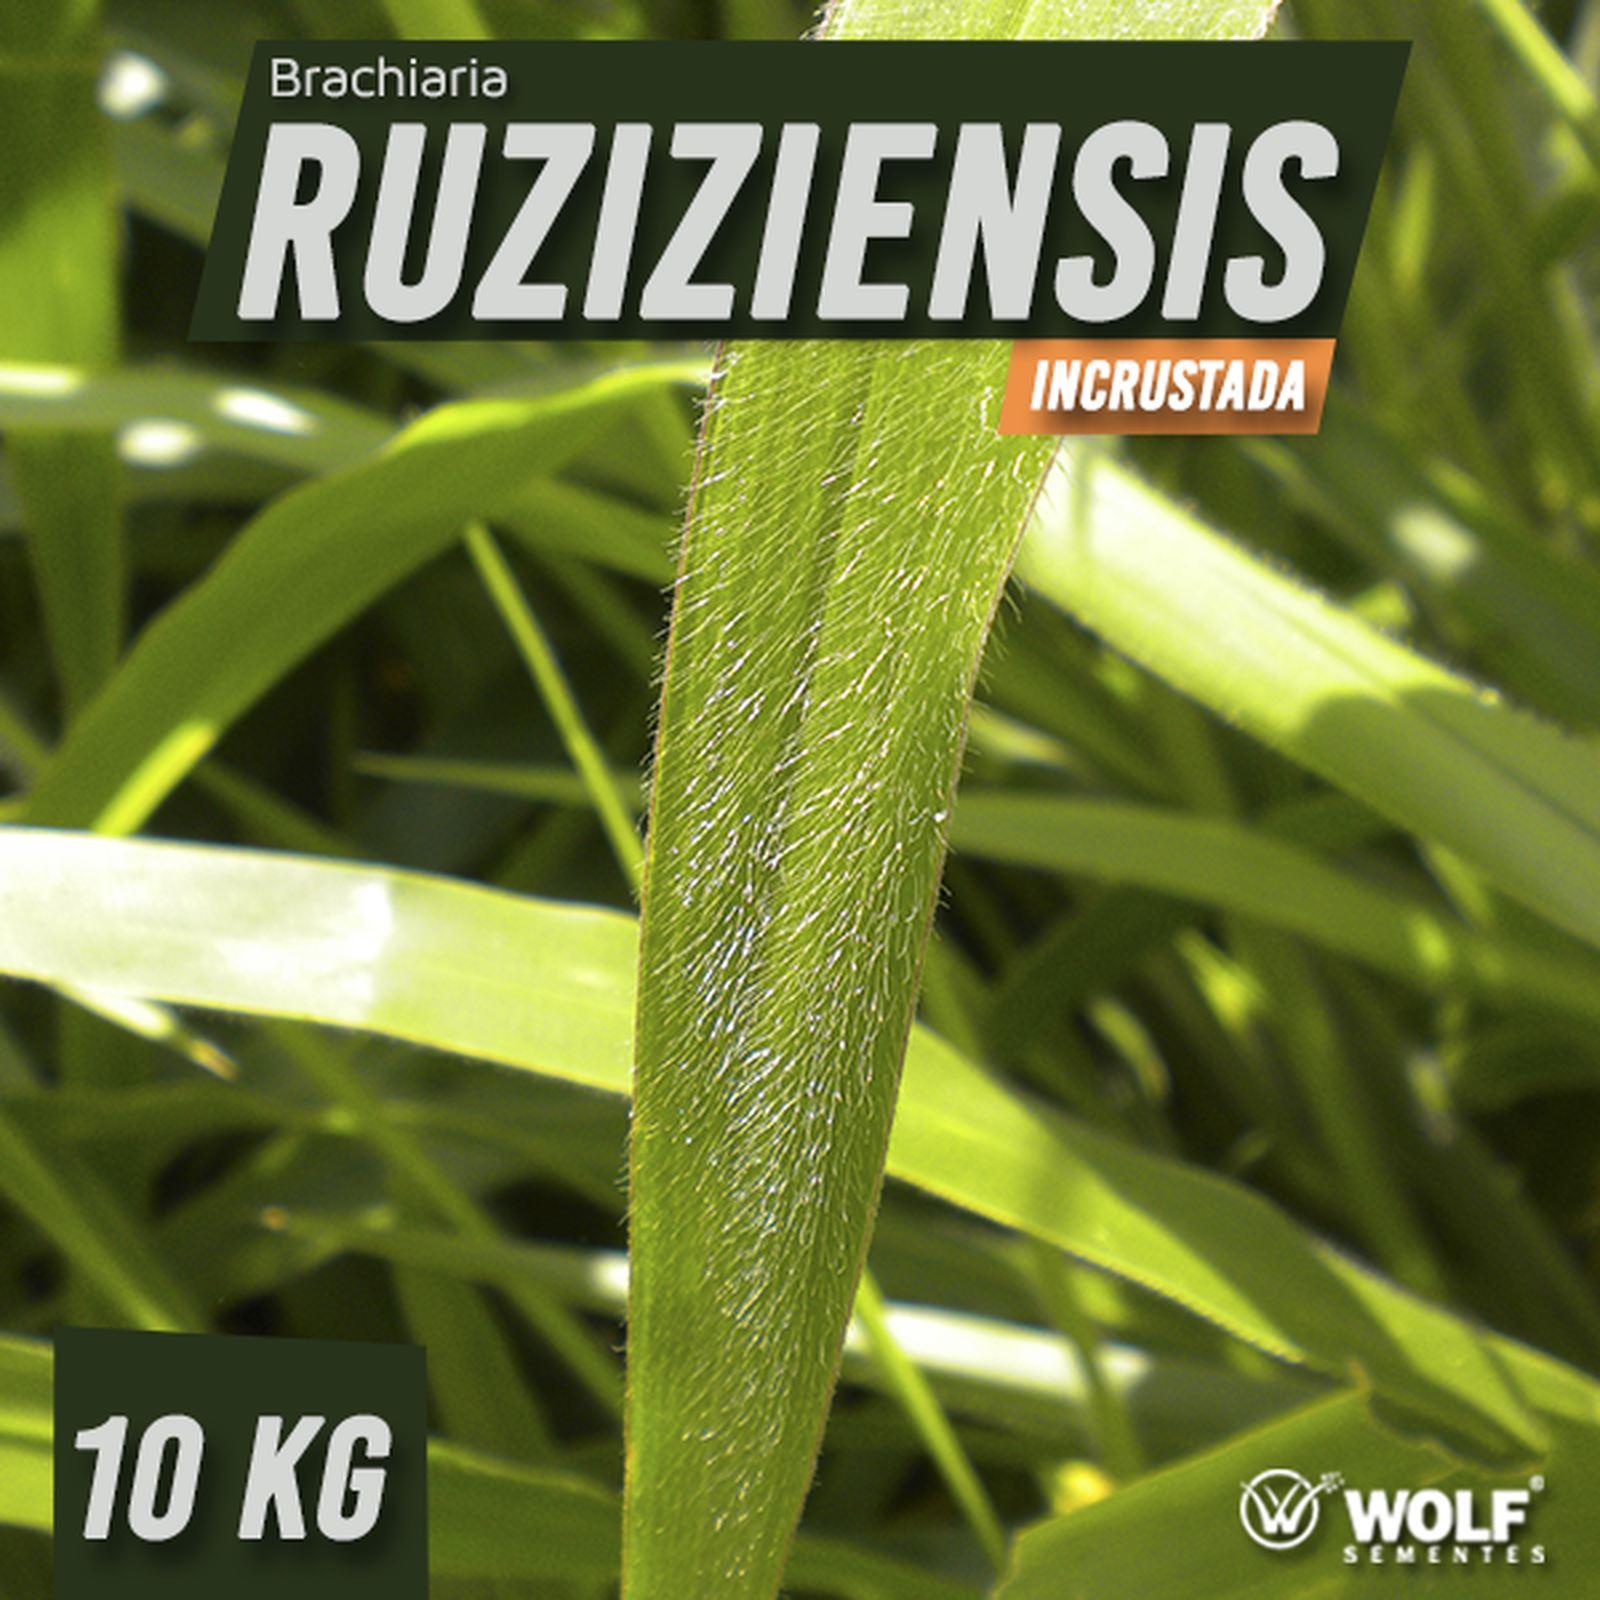 Sementes para Capim. RUZIZIENSIS Incrustada (Saco de 10kg)